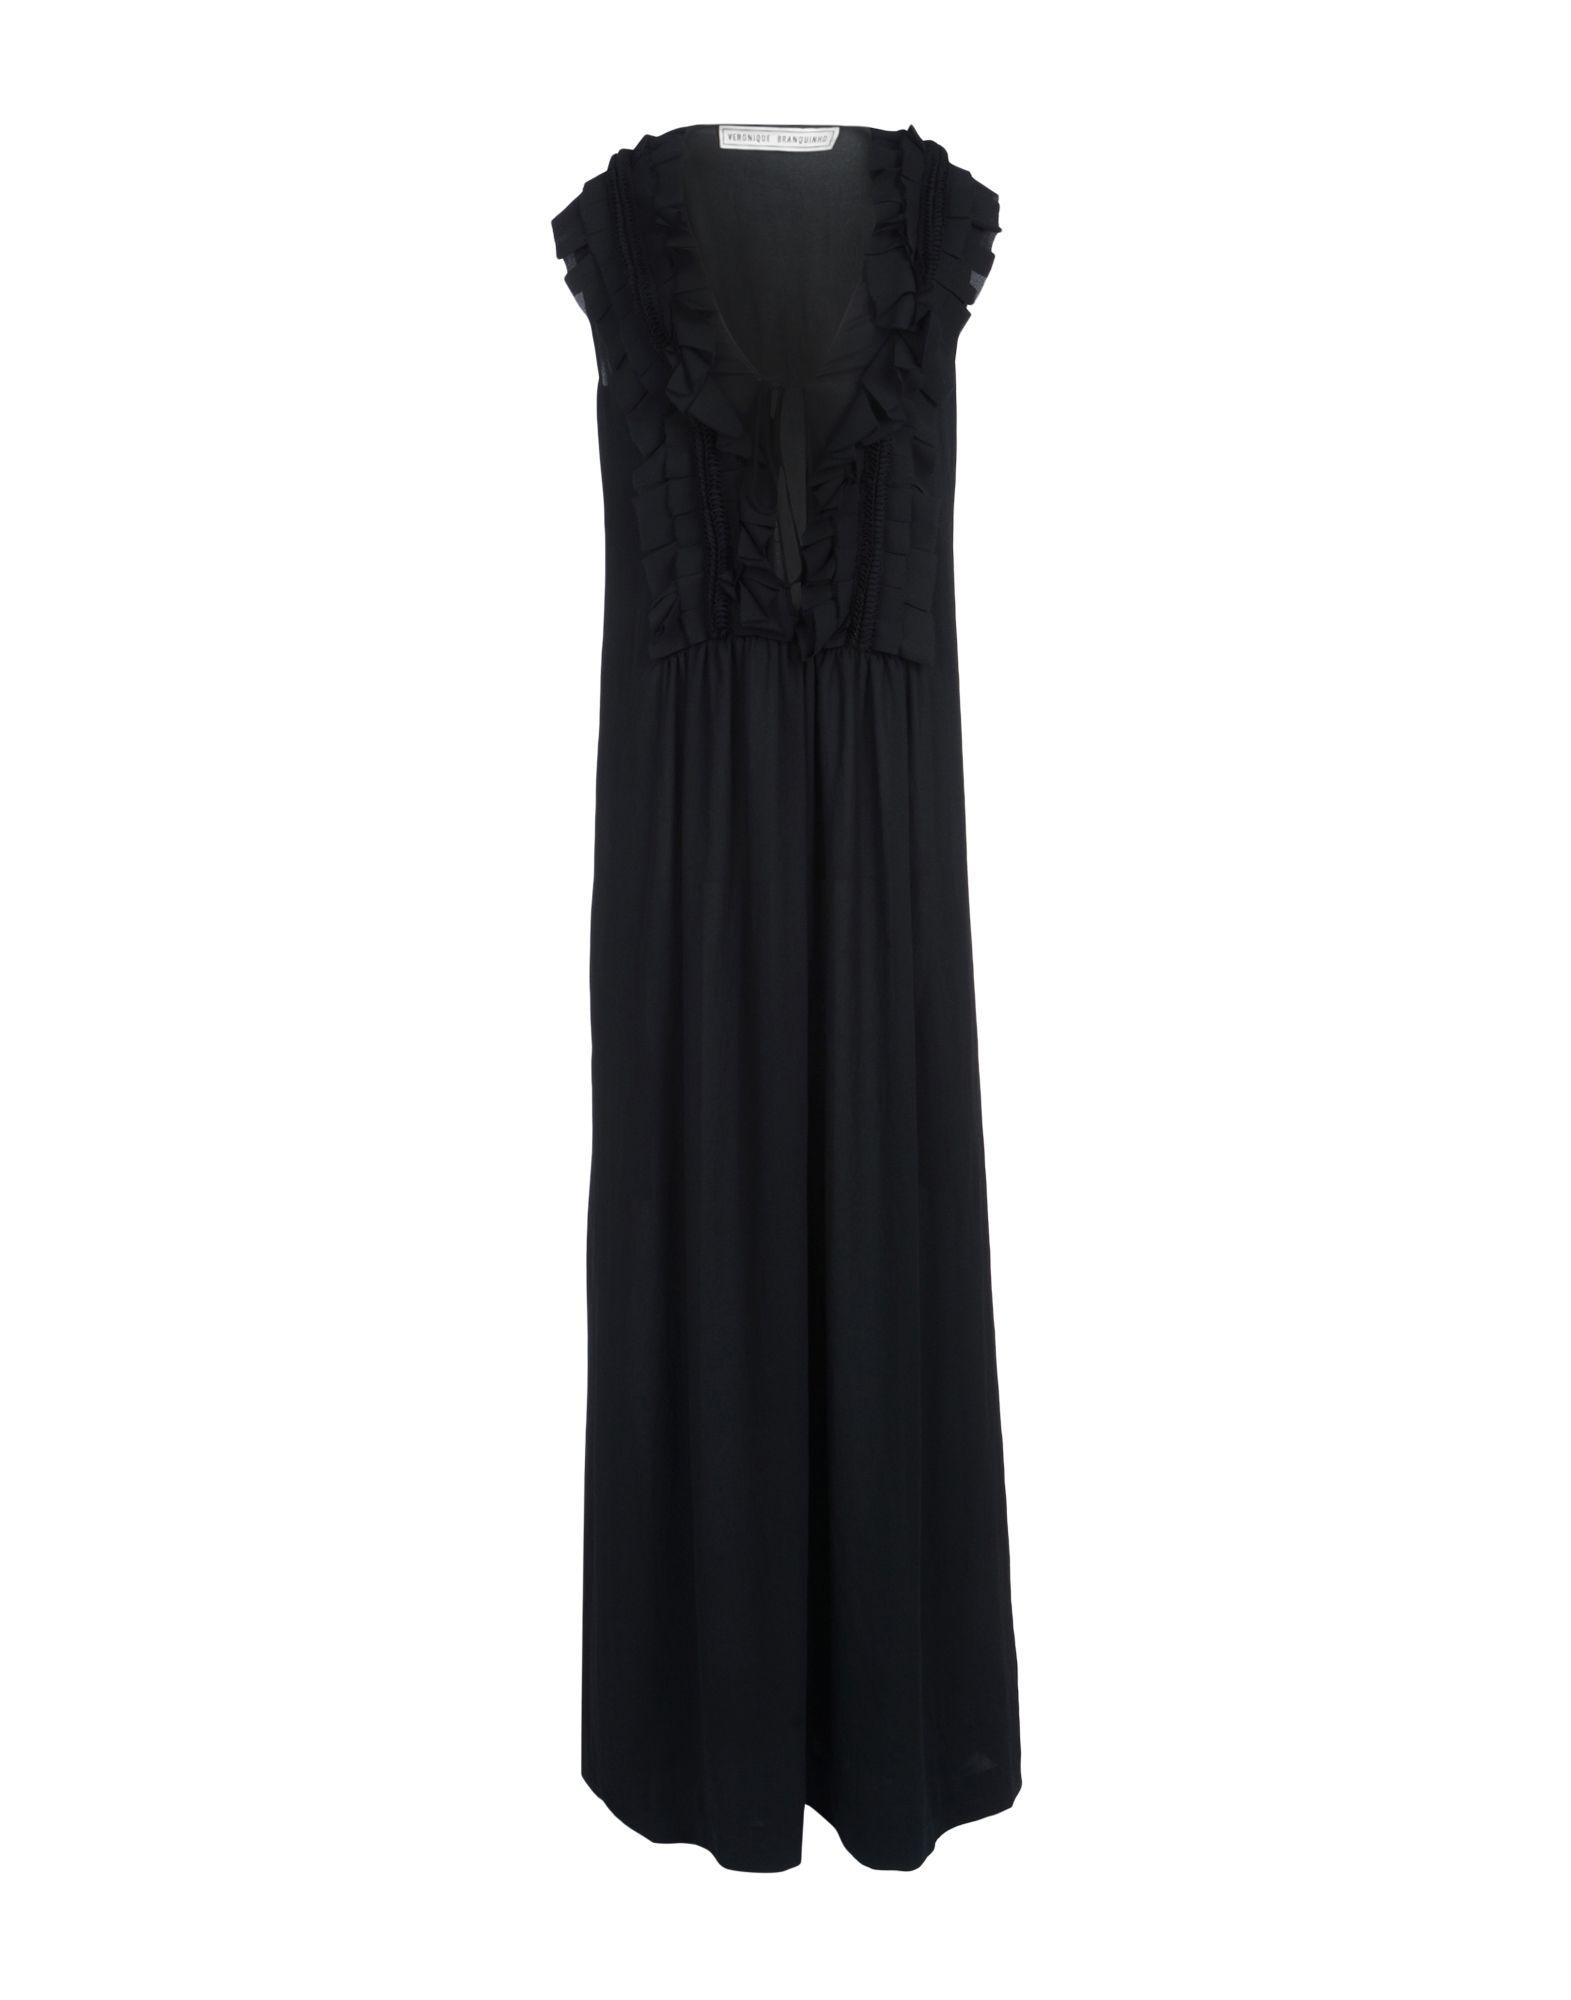 VERONIQUE BRANQUINHO Длинное платье veronique branquinho полусапоги и высокие ботинки page 8